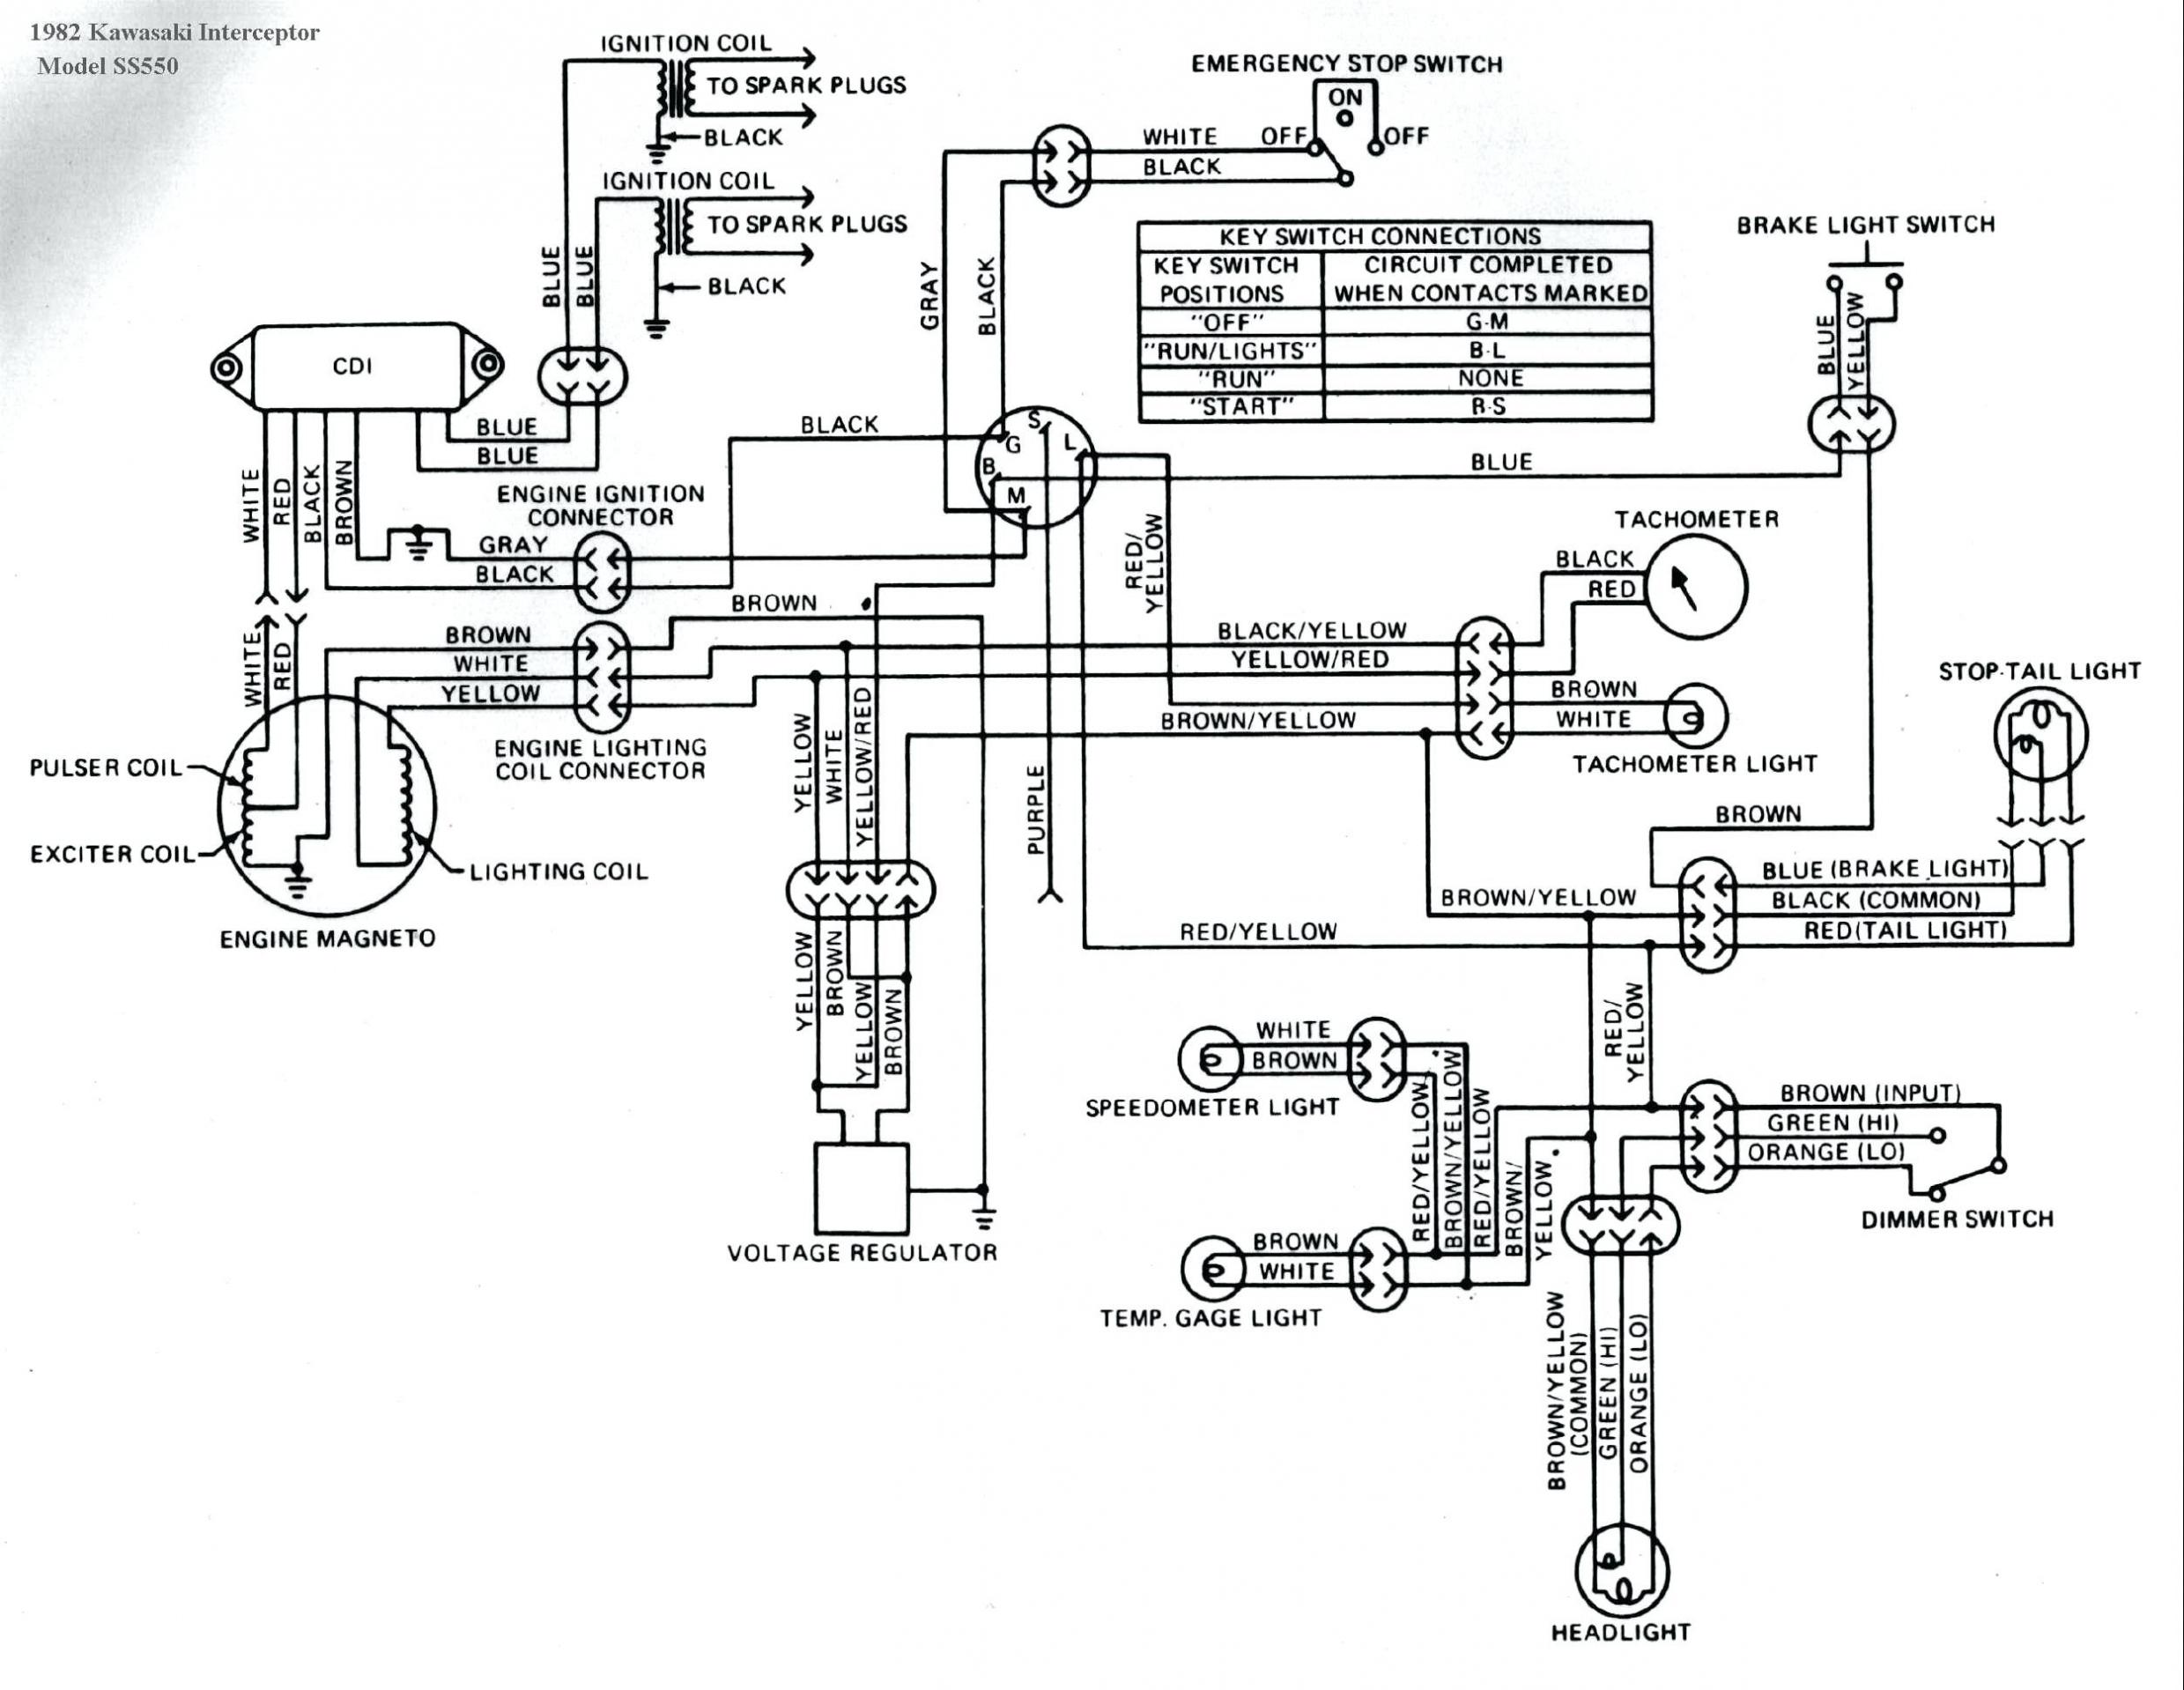 110 Wiring Diagram | Wiring Library - 220 To 110 Wiring Diagram